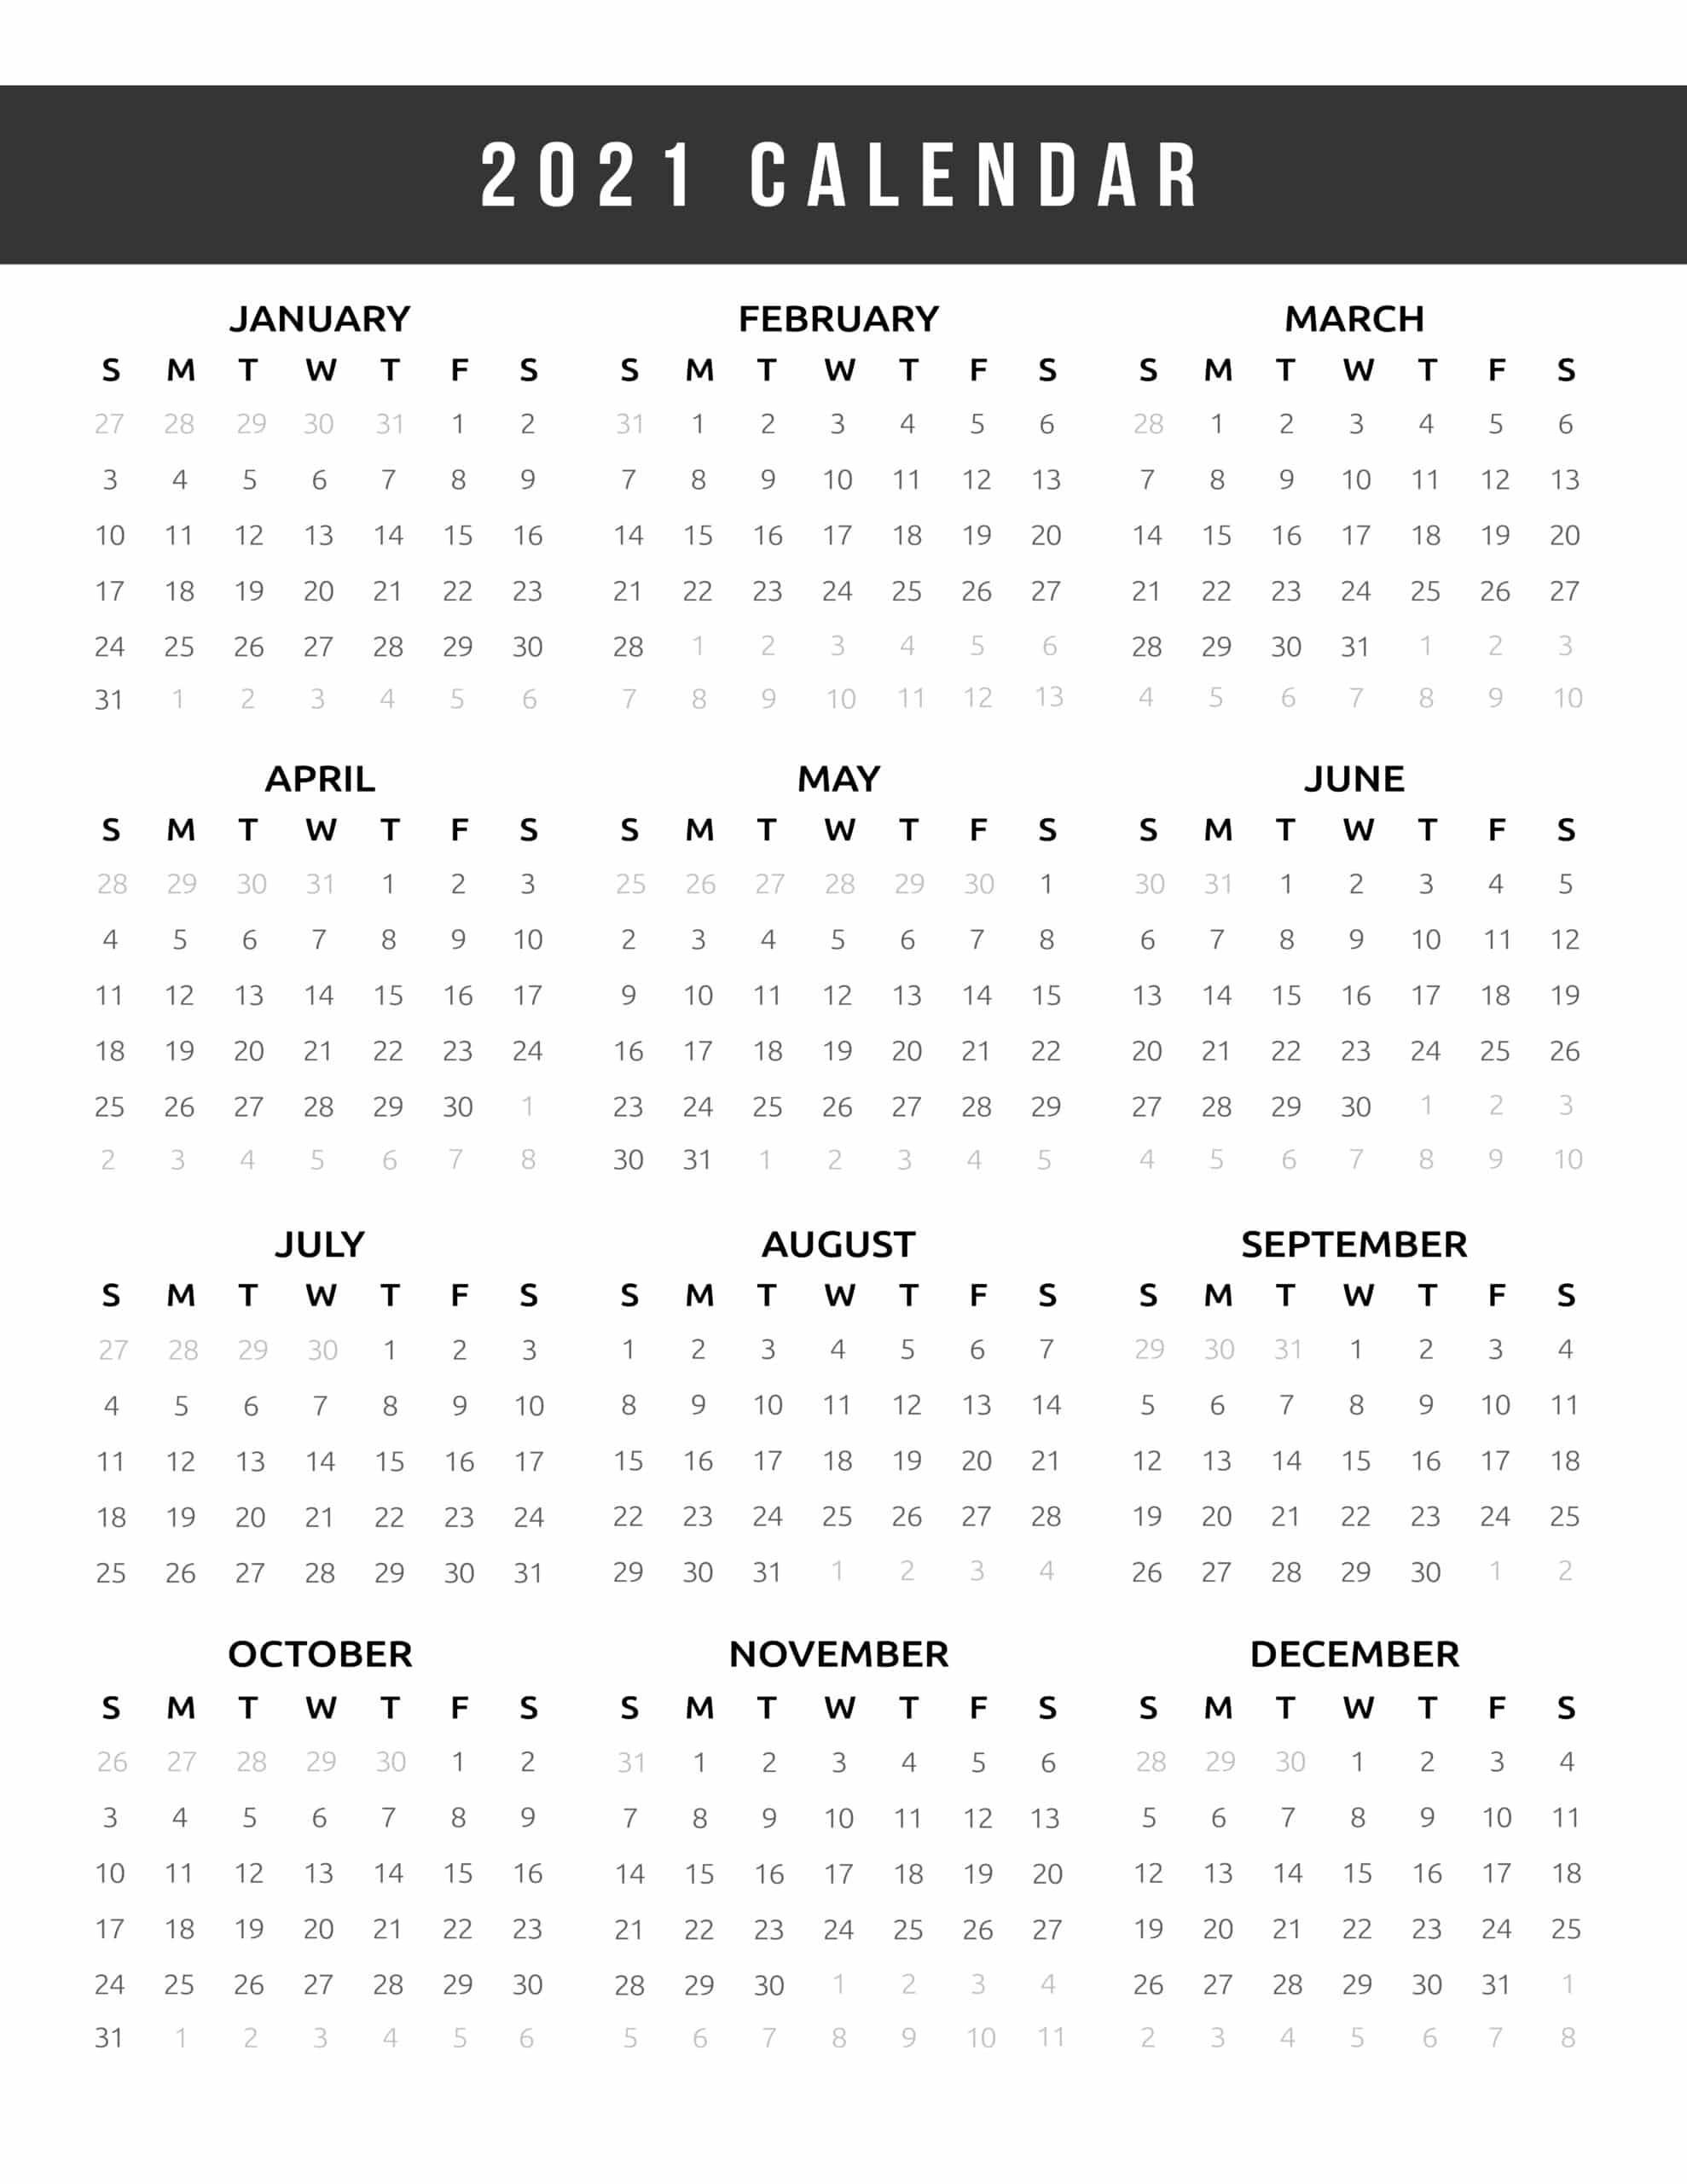 Calendar 2021 Printable One Page - World Of Printables  Easy To Print 2021 Calendar